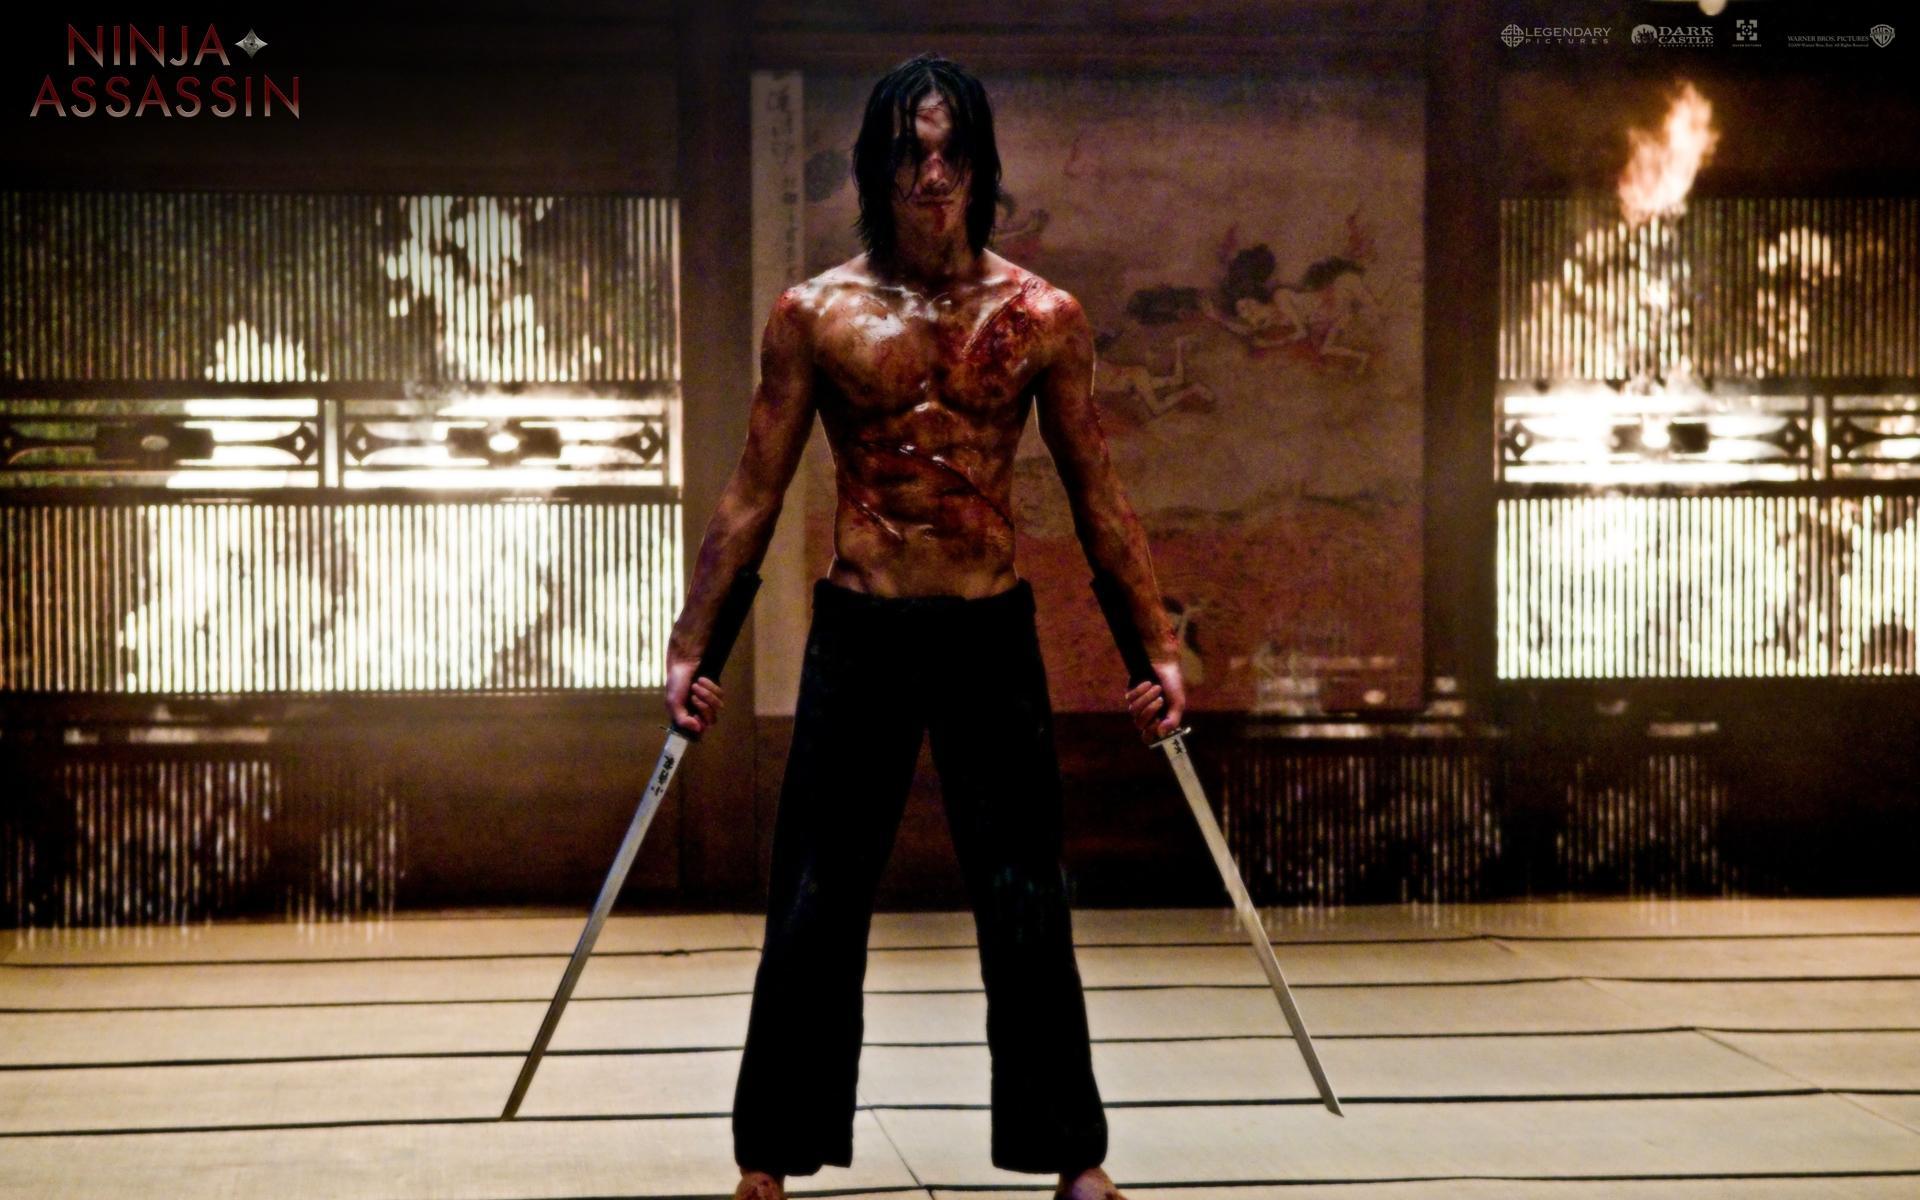 Image Ninja Assassin Movies